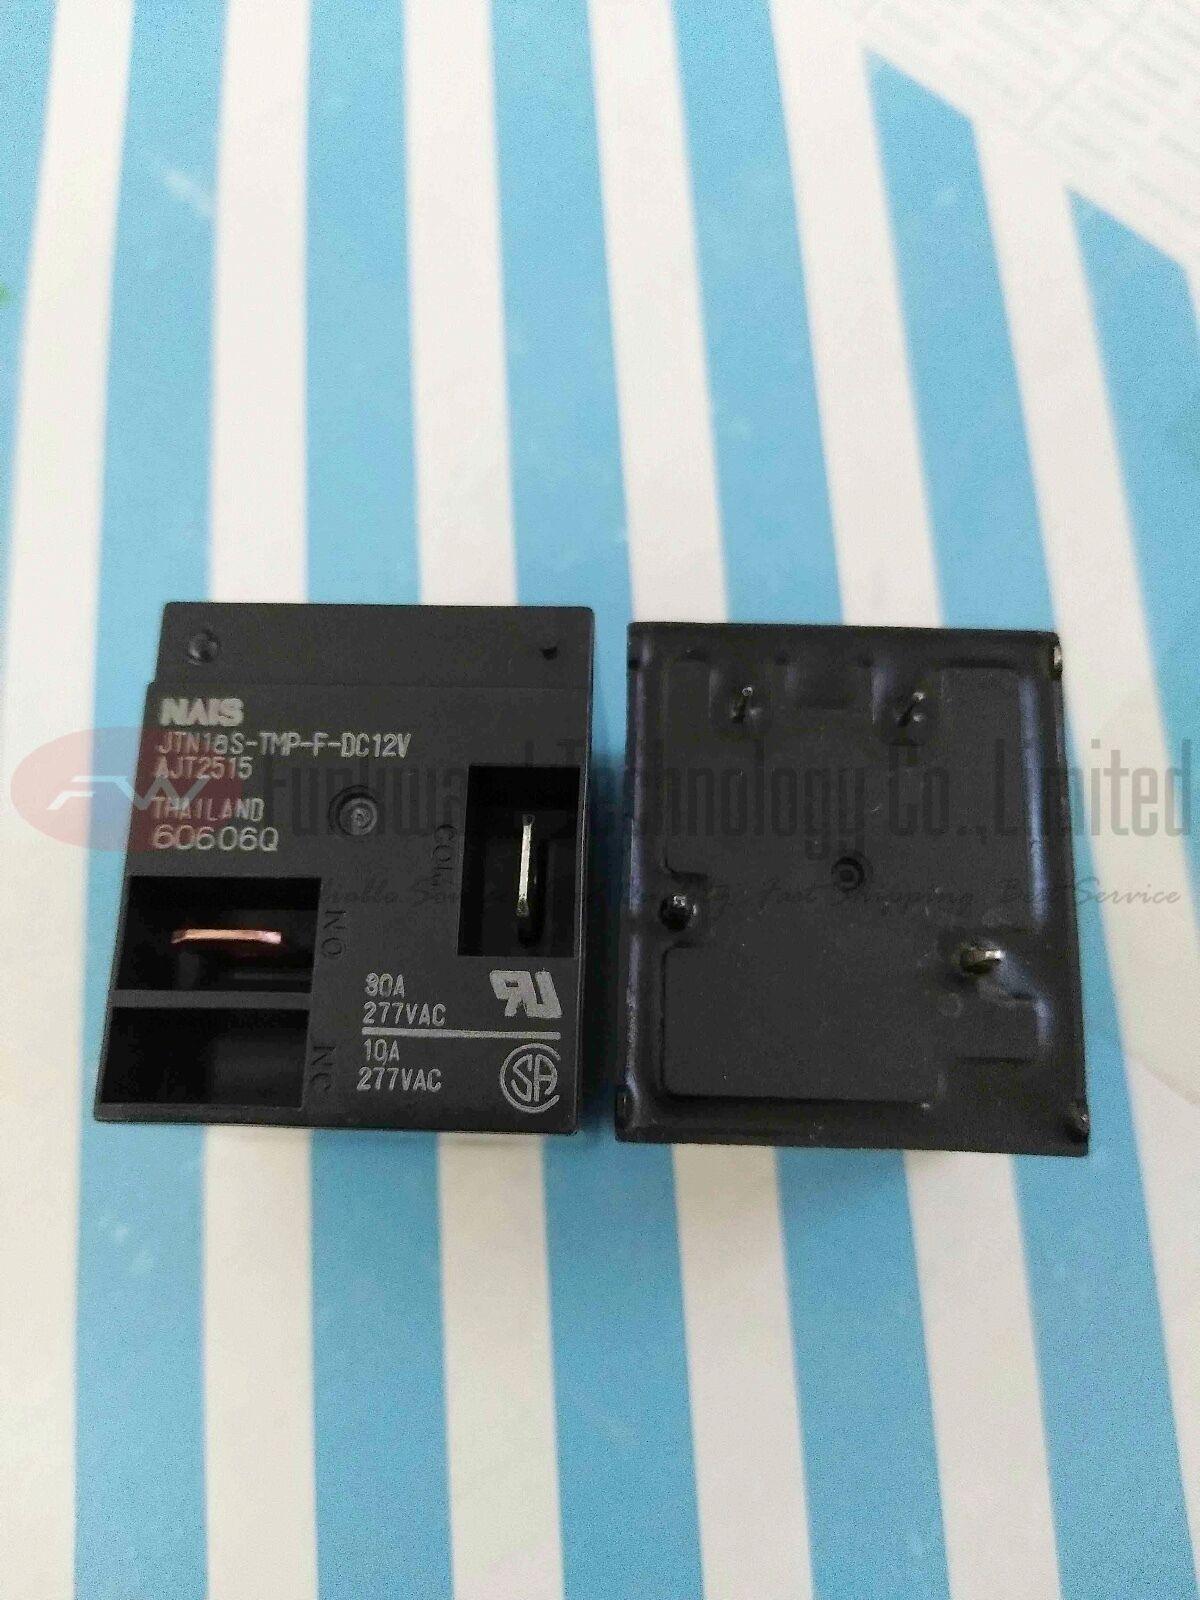 JTN1aS-PA-F-DC12V Power Relay 30A 12VDC 4 Pins x 1PC NEW